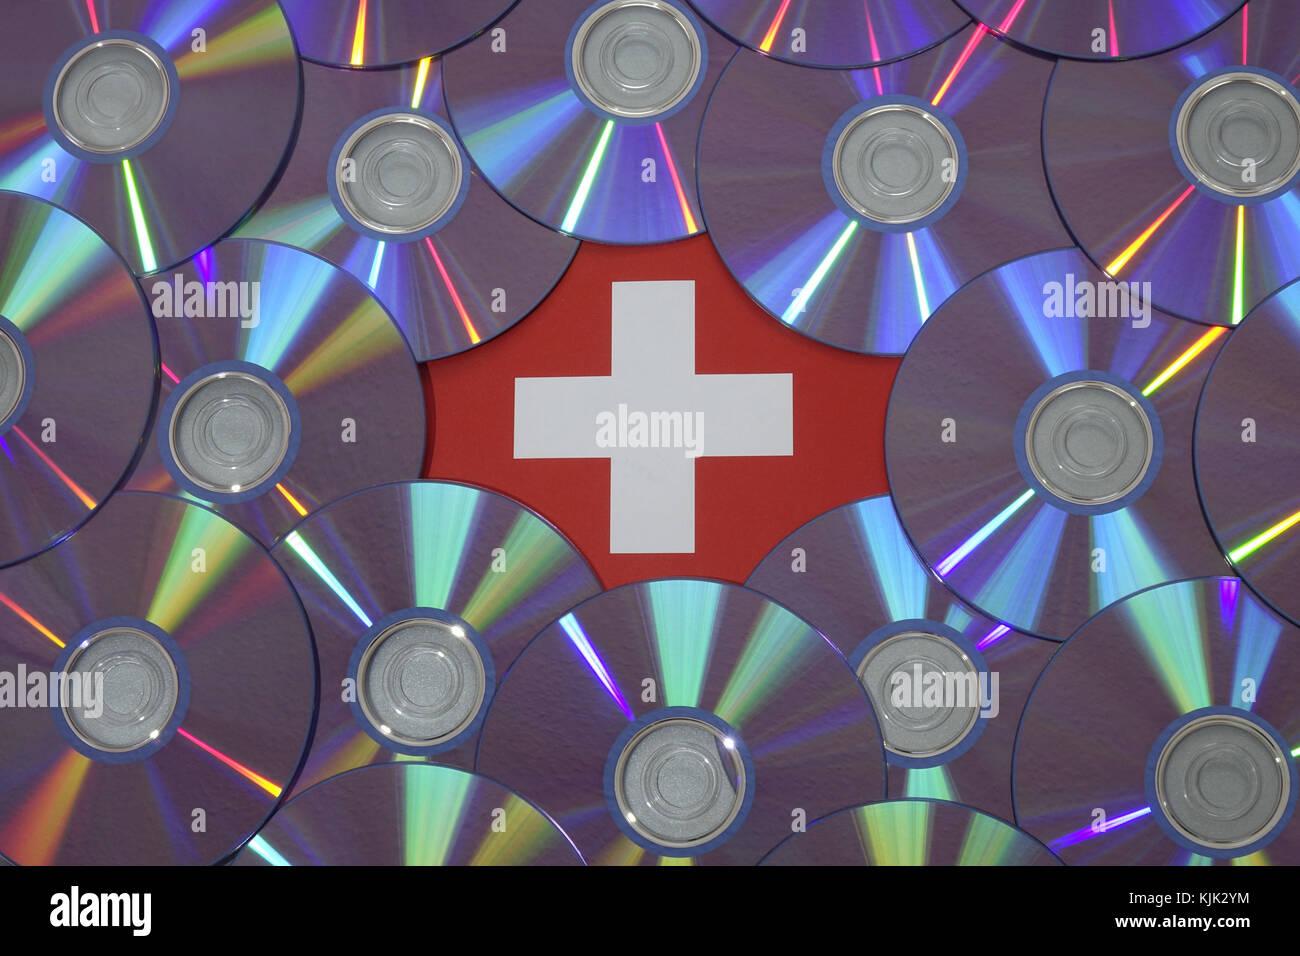 ILLUSTRATION - A Swiss flag under several CDs, 07.05.2017. - NO WIRE SERVICE - Photo: Sascha Steinach/dpa-Zentralbild/dpa Stock Photo